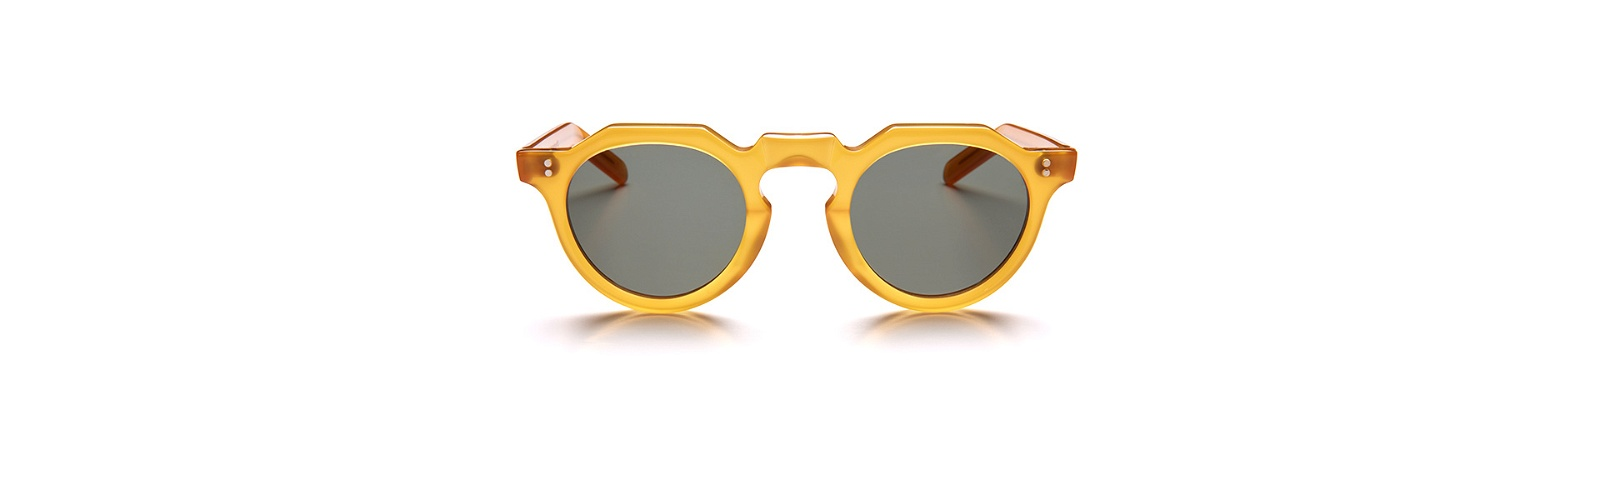 jamboree sunglasses los angeles honey